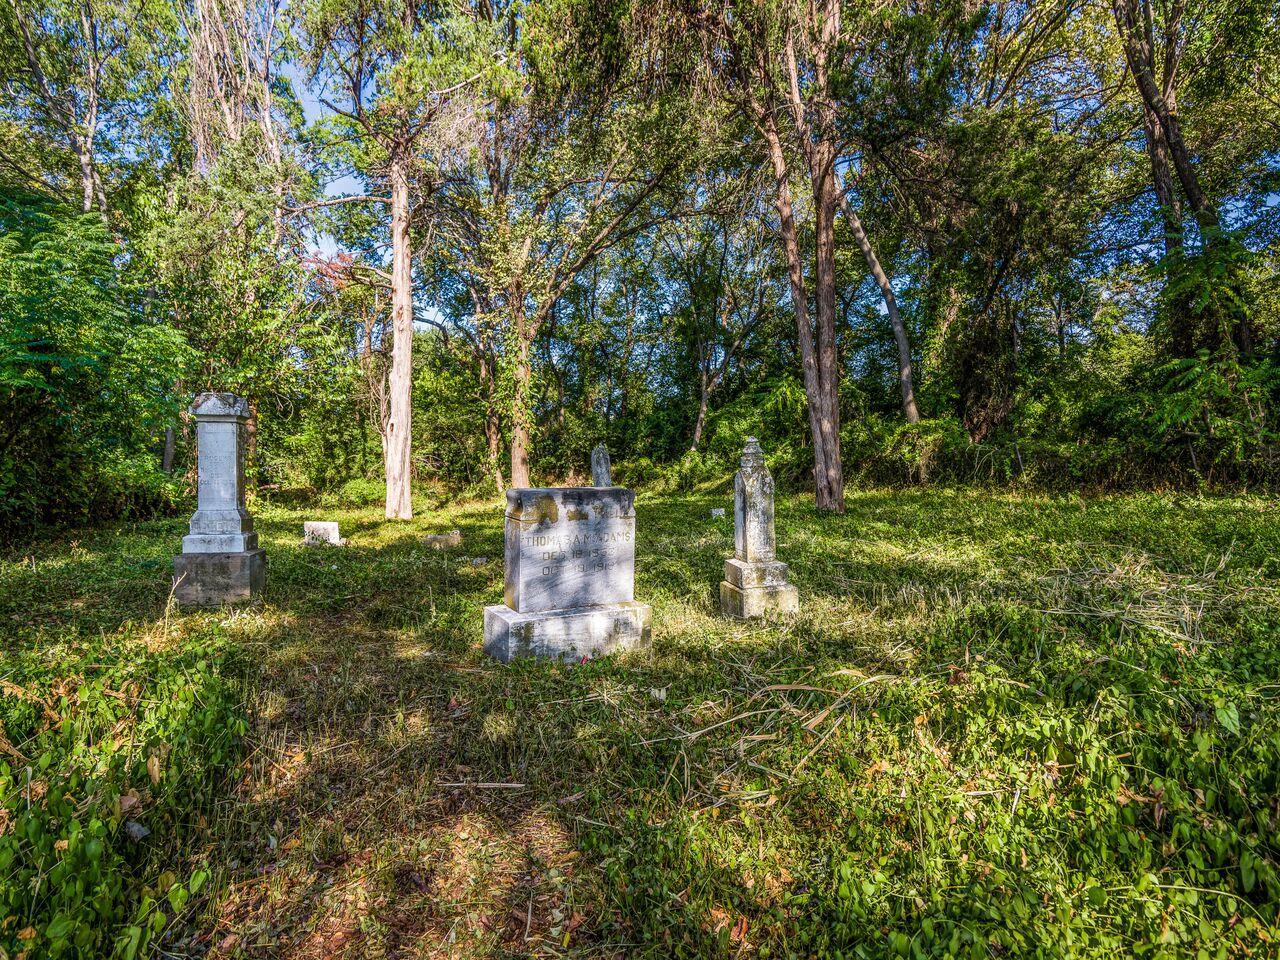 McAdam's Cemetery in Oak Cliff (Photo by Michael Cagle)